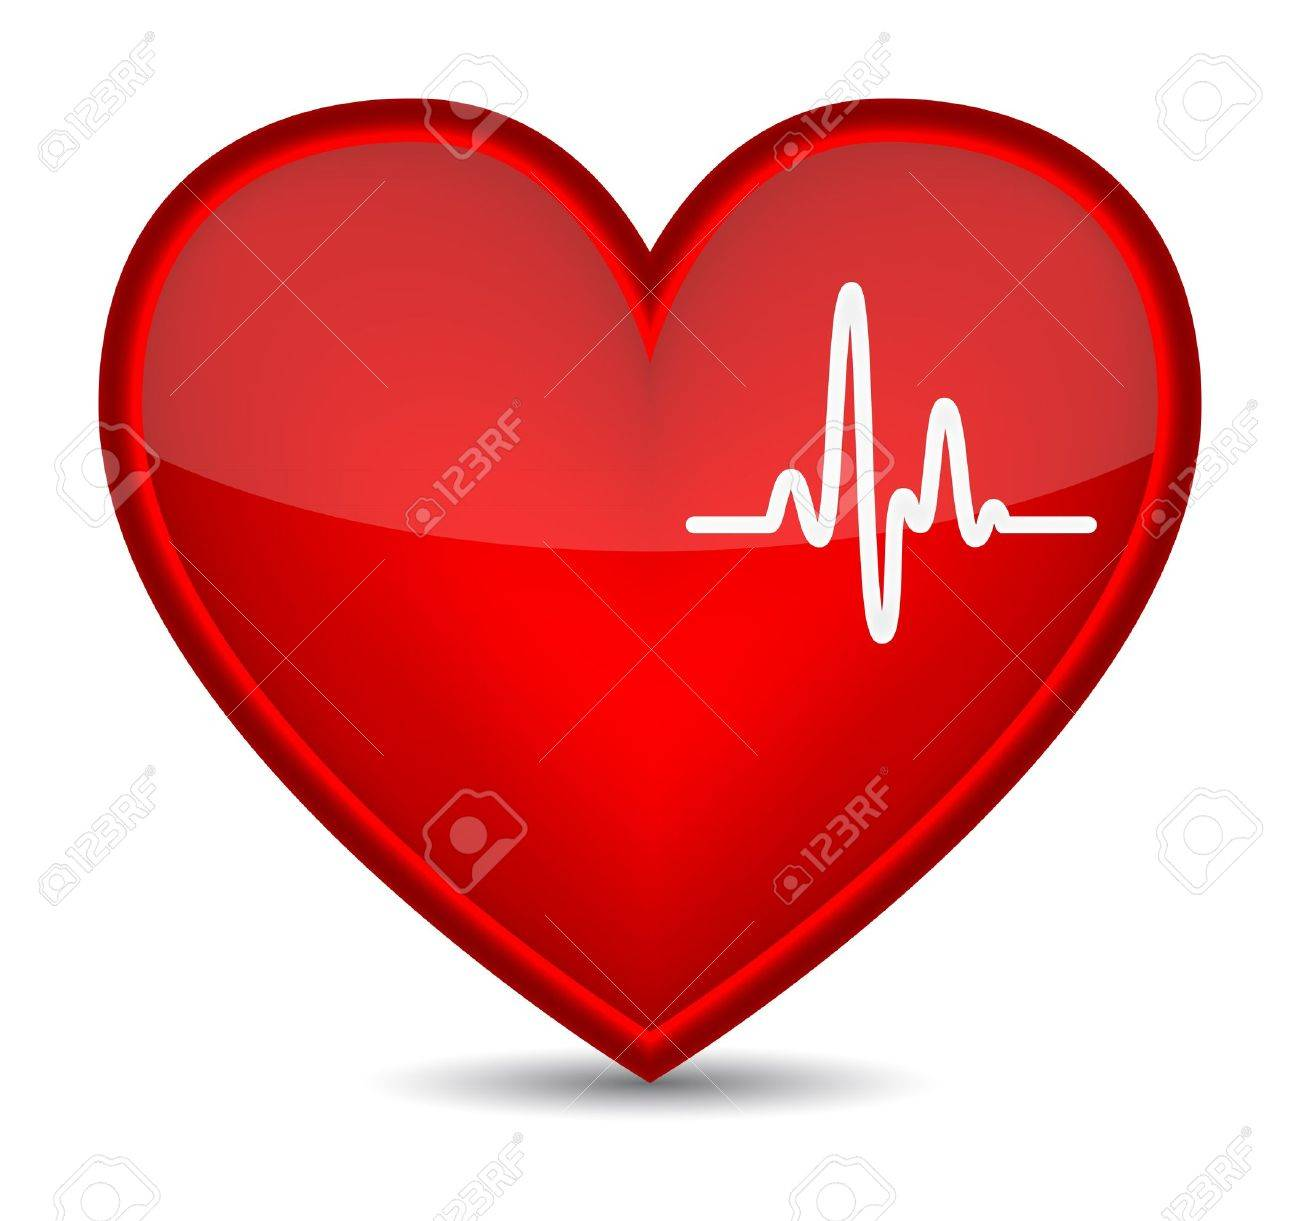 Cardiogram on red heart shape. Vector illustration - 15481347